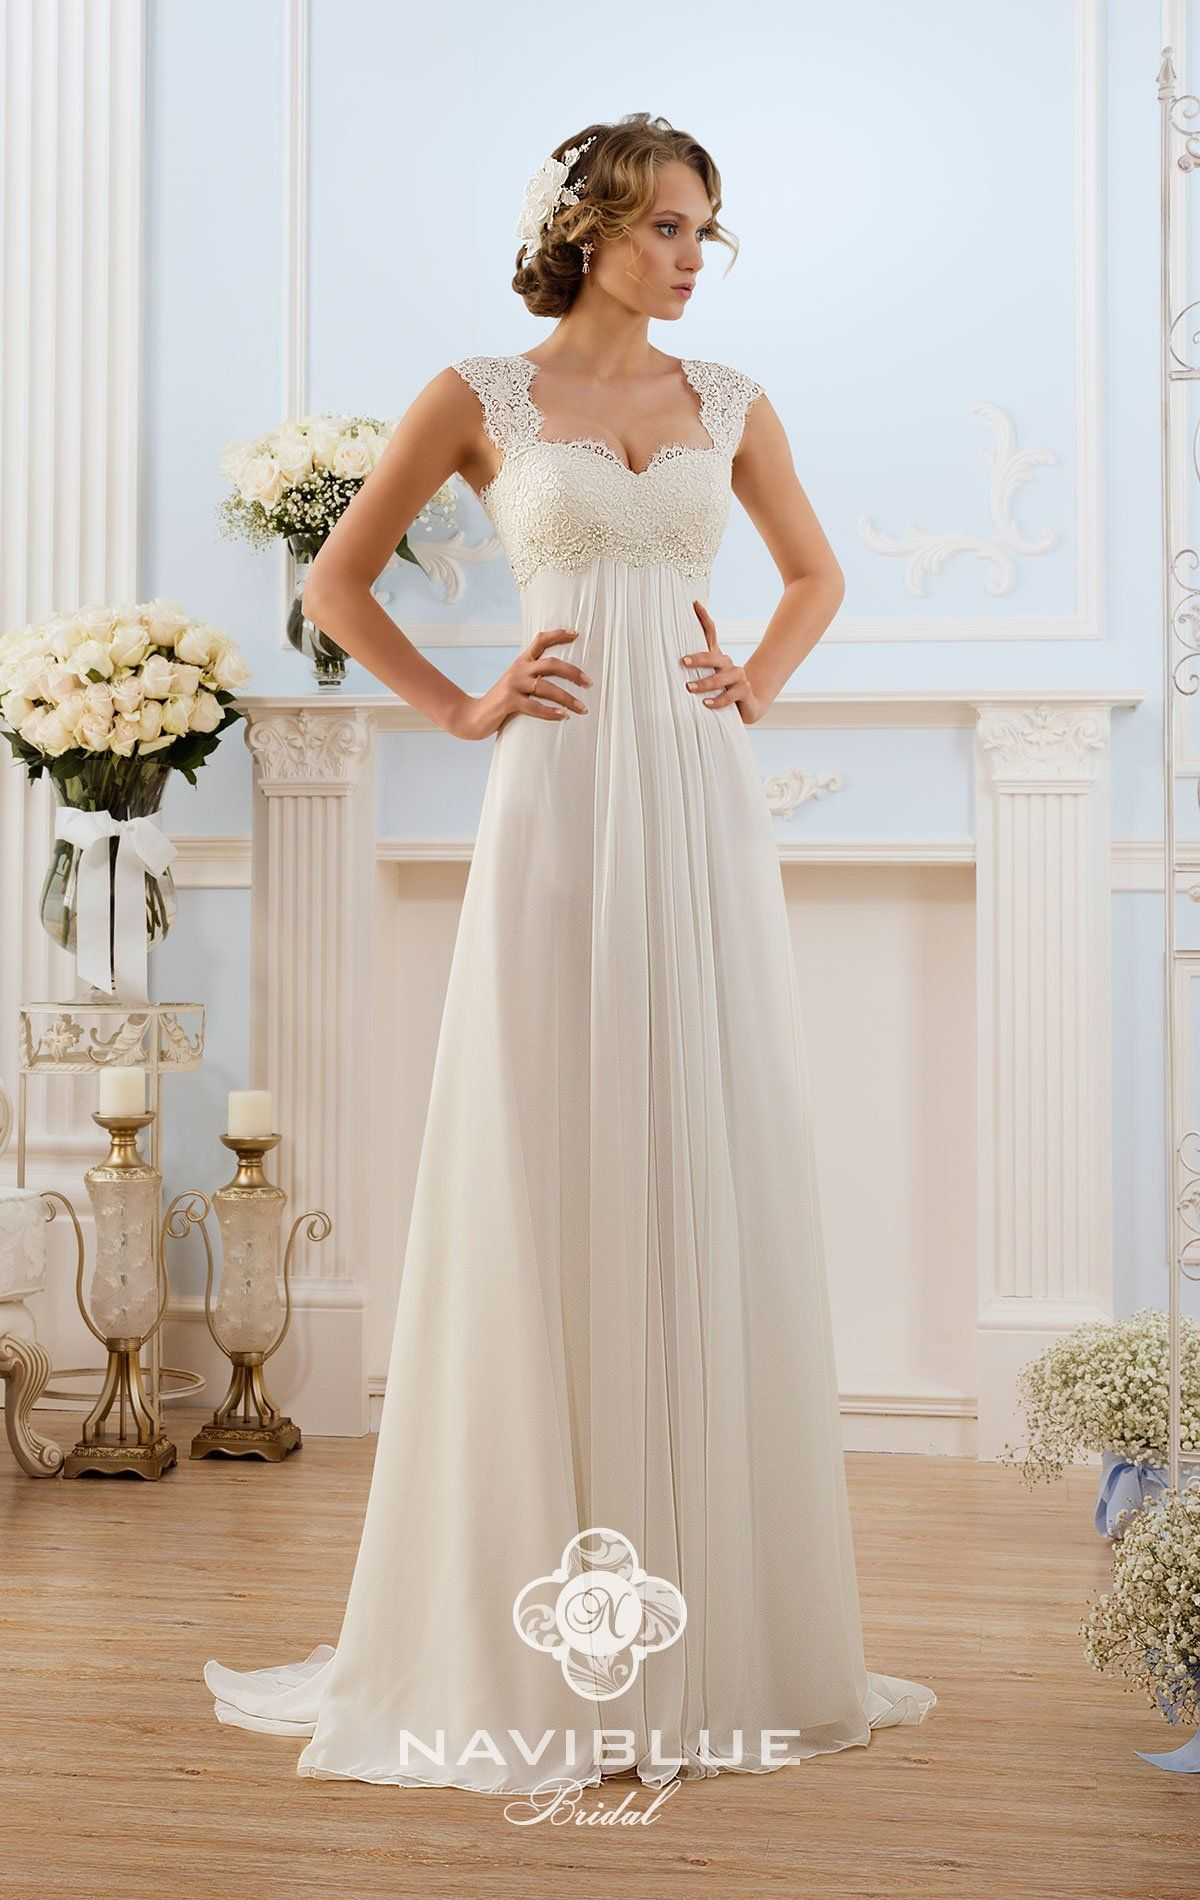 Brautmode standesamt bielefeld